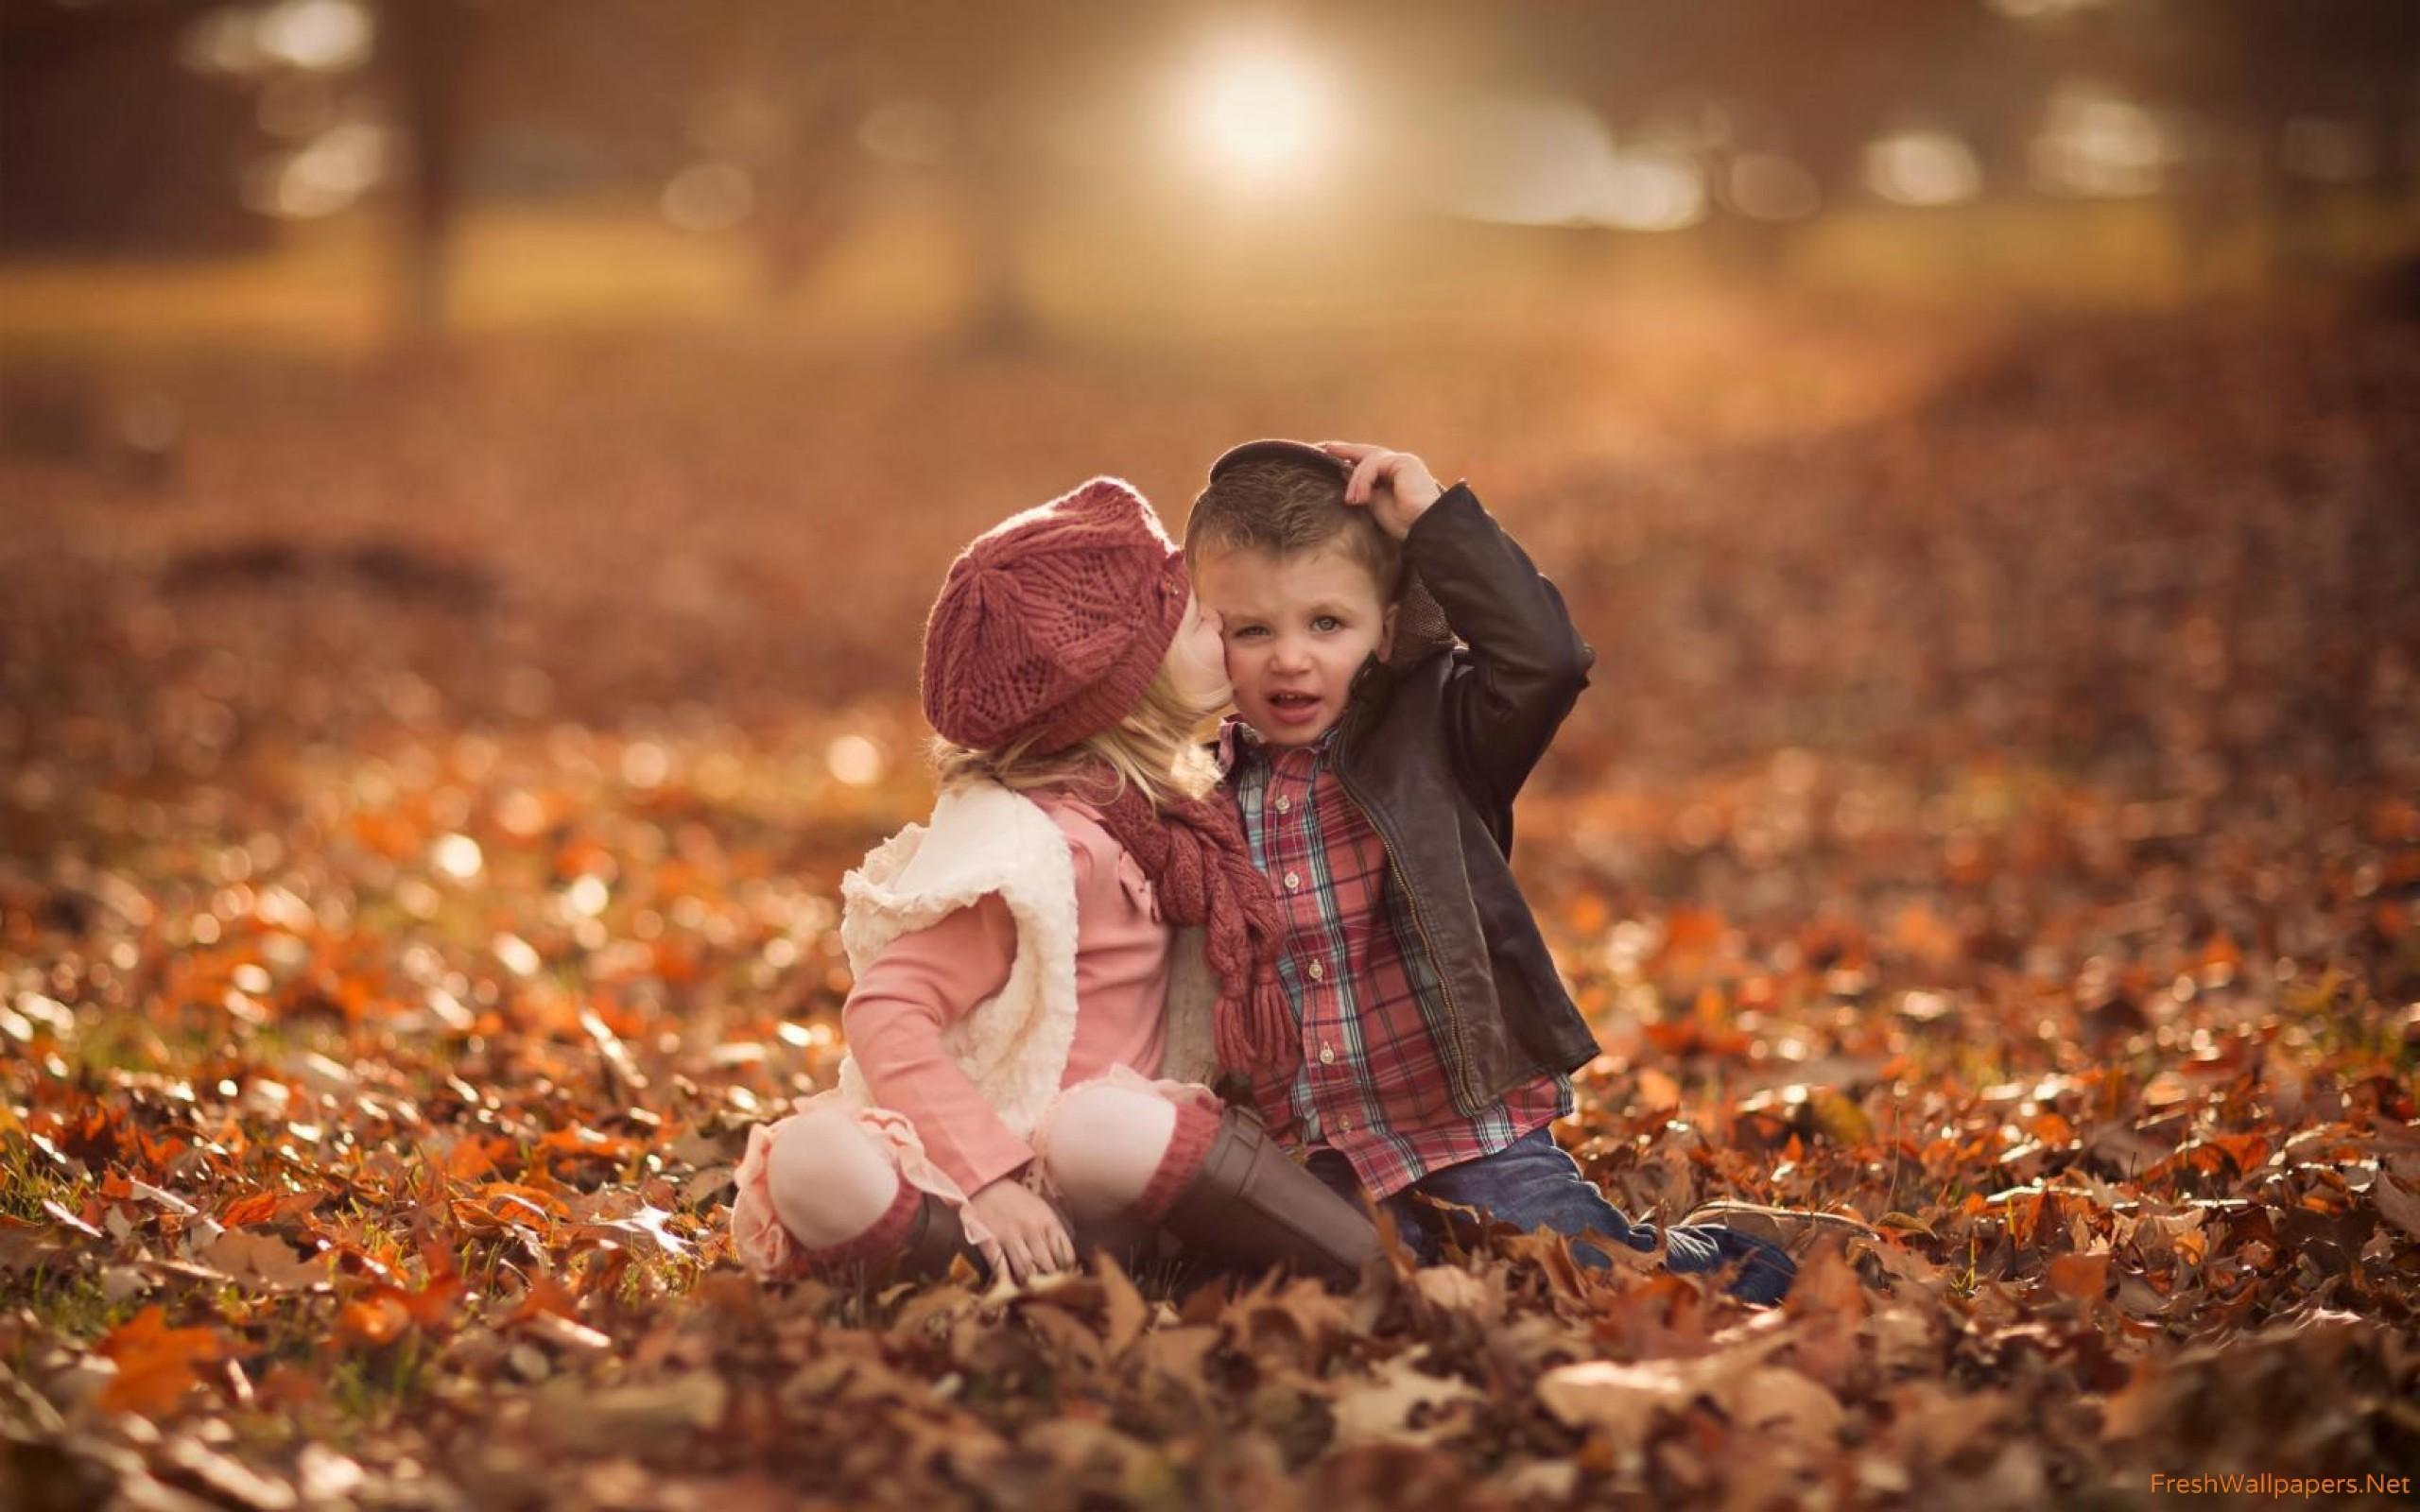 Cute boy hd wallpaper - Cute Baby Girl And Boy Kissing Hd Wallpapers Hd Wallpapers